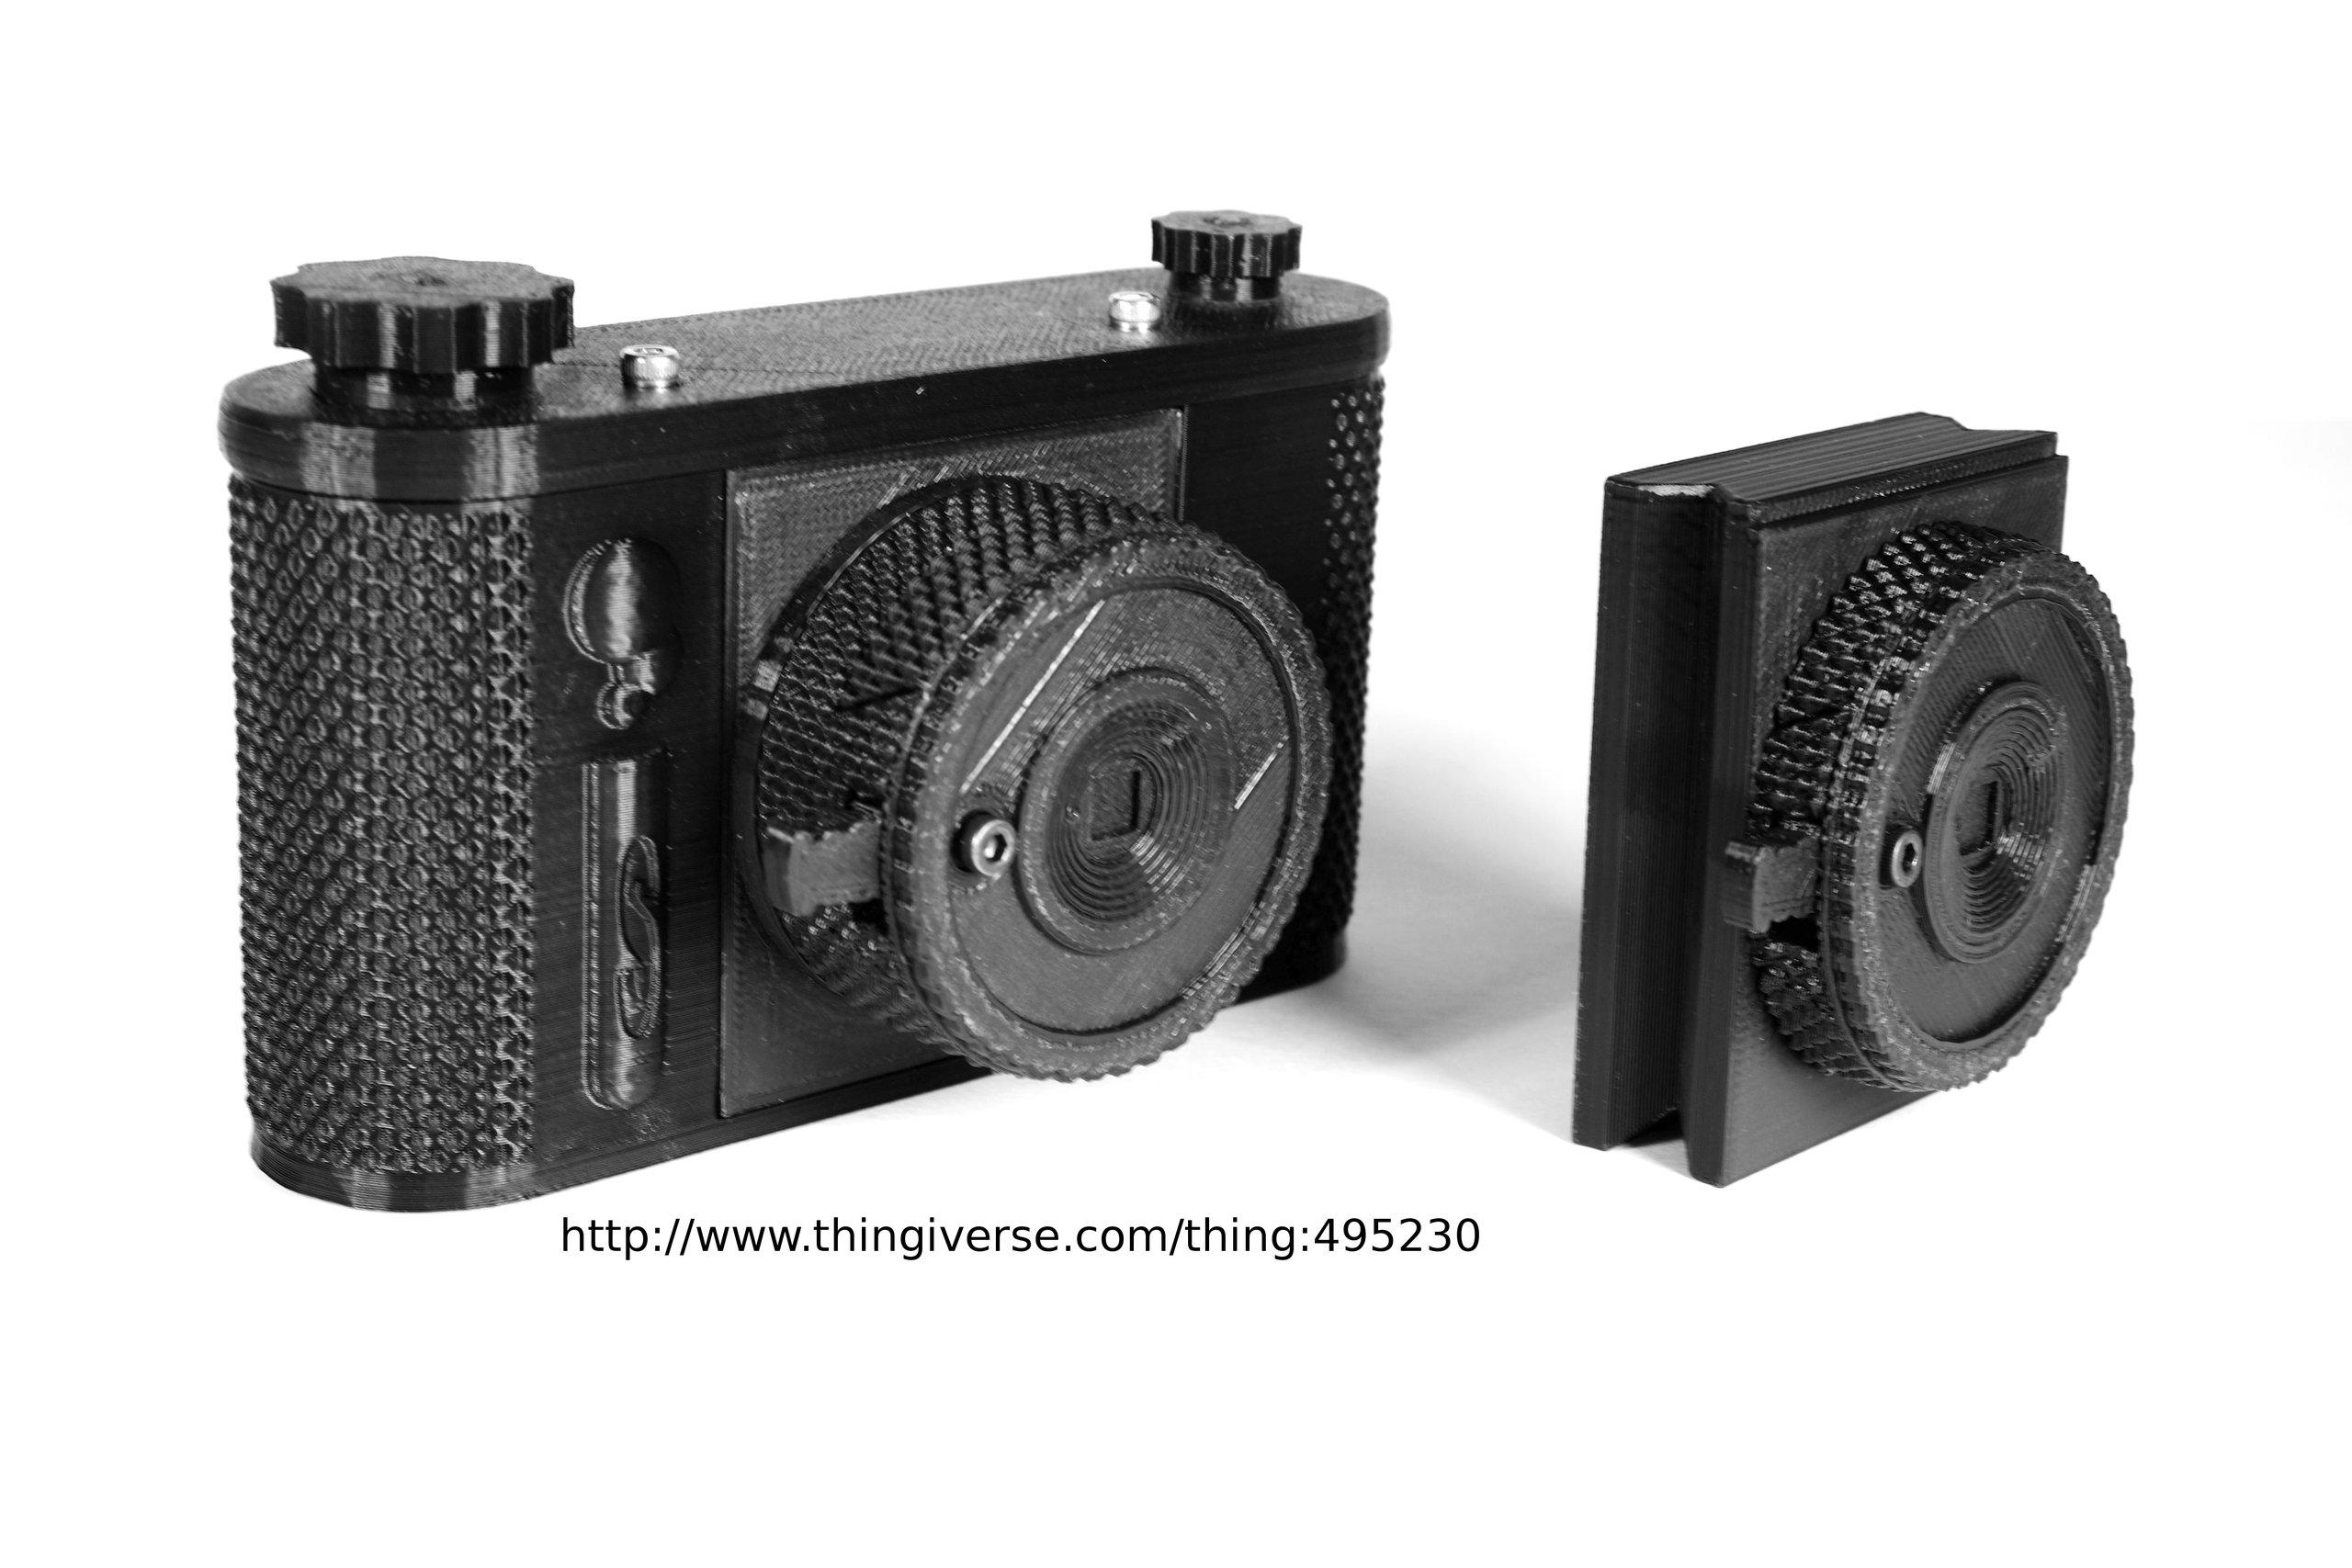 terraPin 3Dprinted Pinhole Camera (6X6 format) from schlem ...